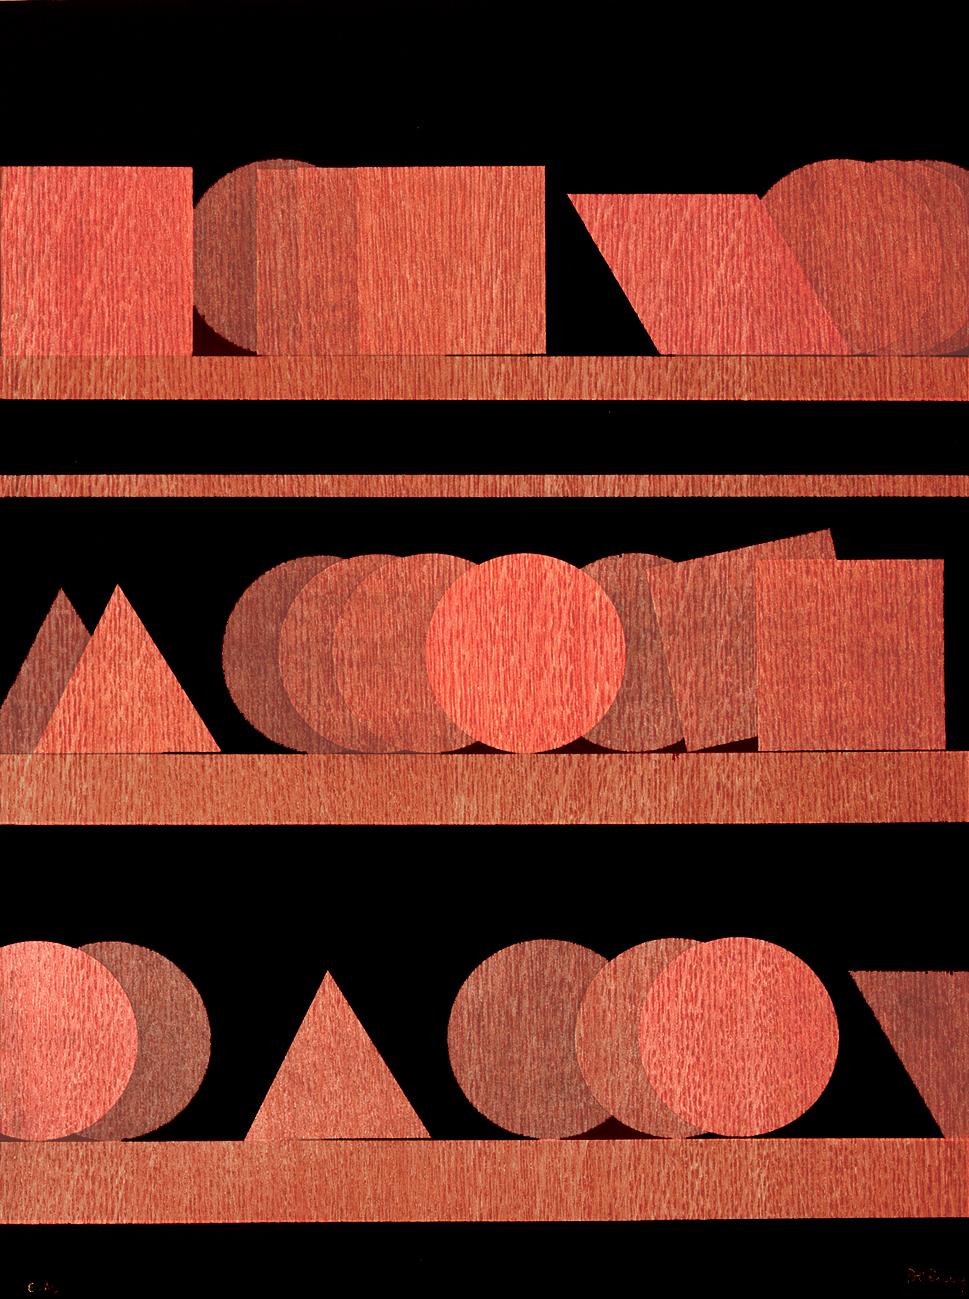 Quatorze cercles, 6 carré, 2 losanges, 3 disques soulignés,  Original Etching, 1977, 26 x 20 in., Signed and Numbered 62/75